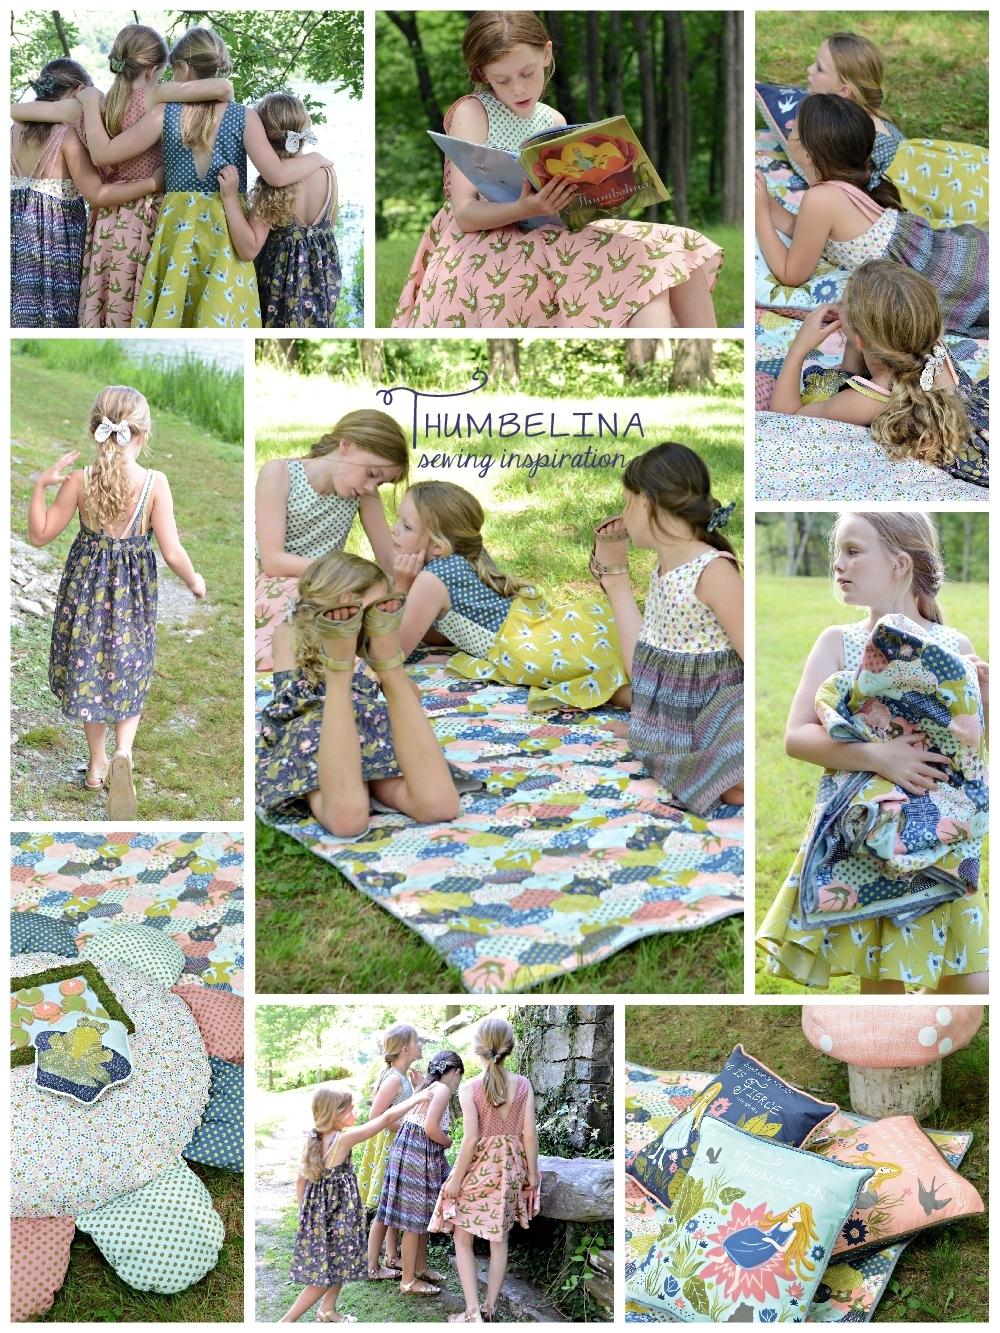 Thumbelina Fabric Sewing Inspiration 1000